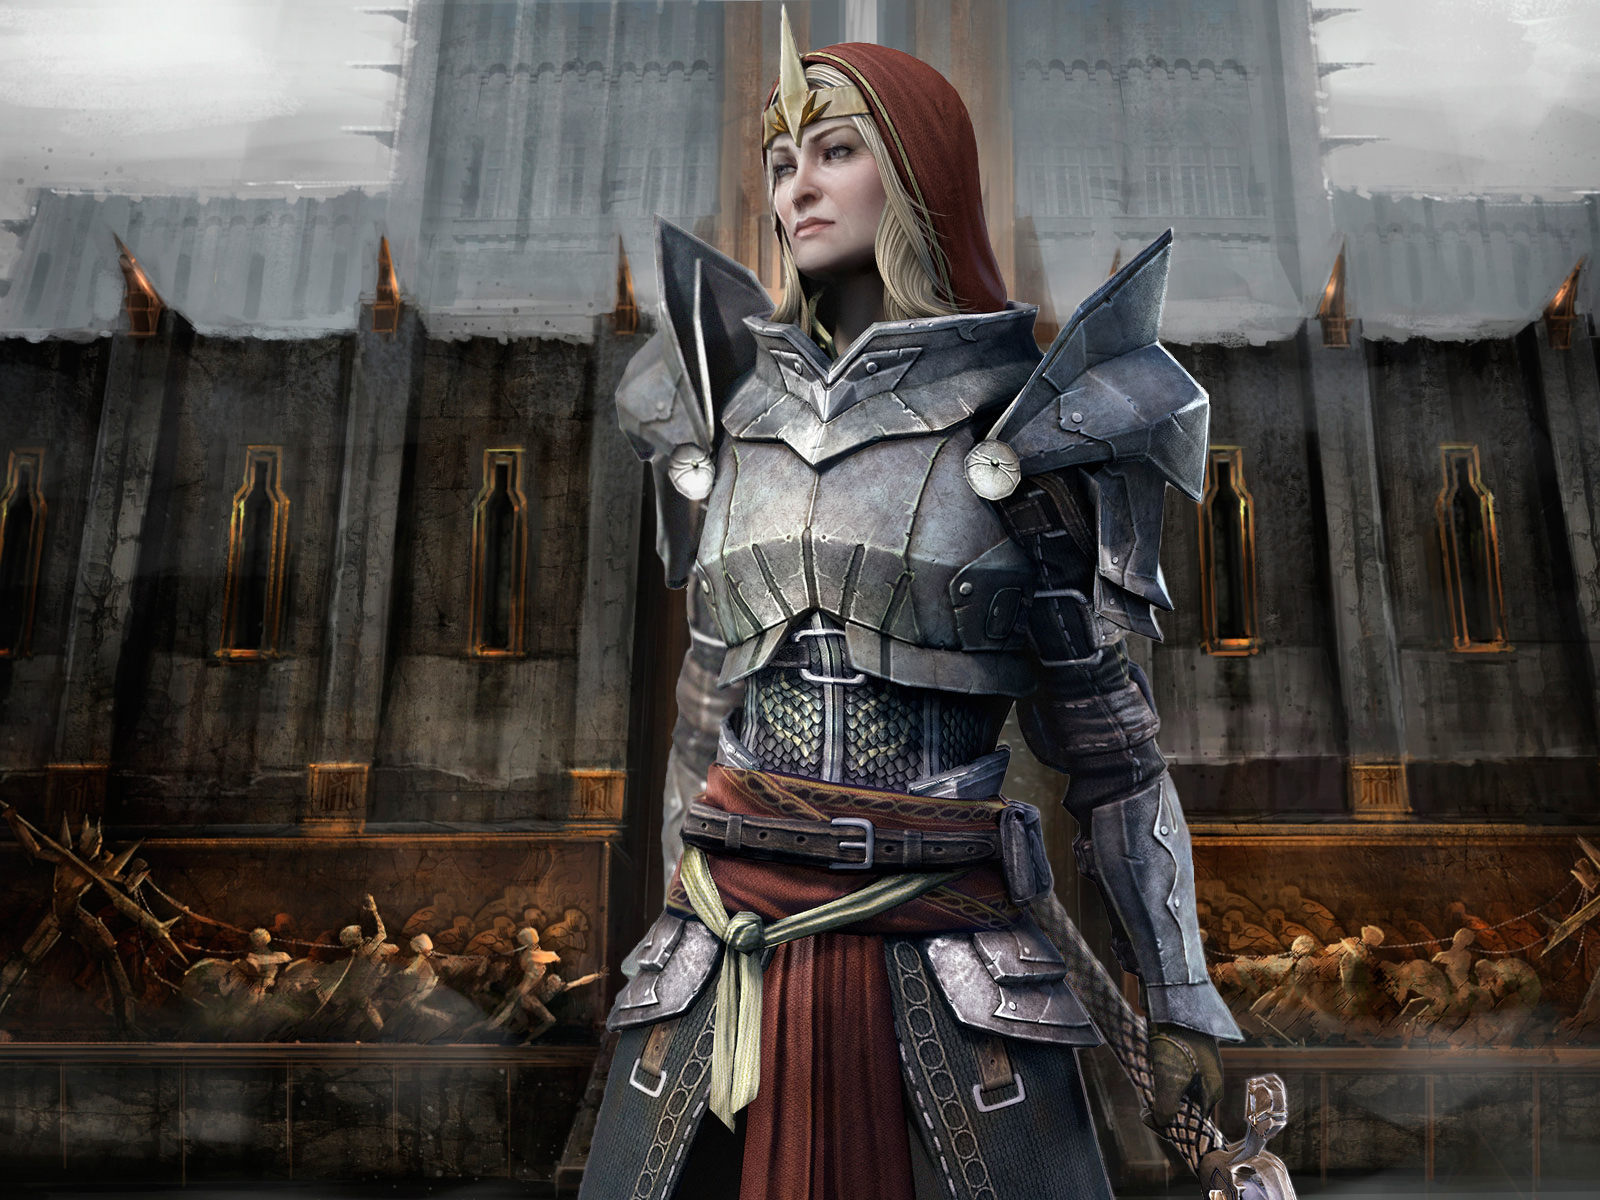 LipstickLesbian/Meredith Stannard (Dragon Age II)